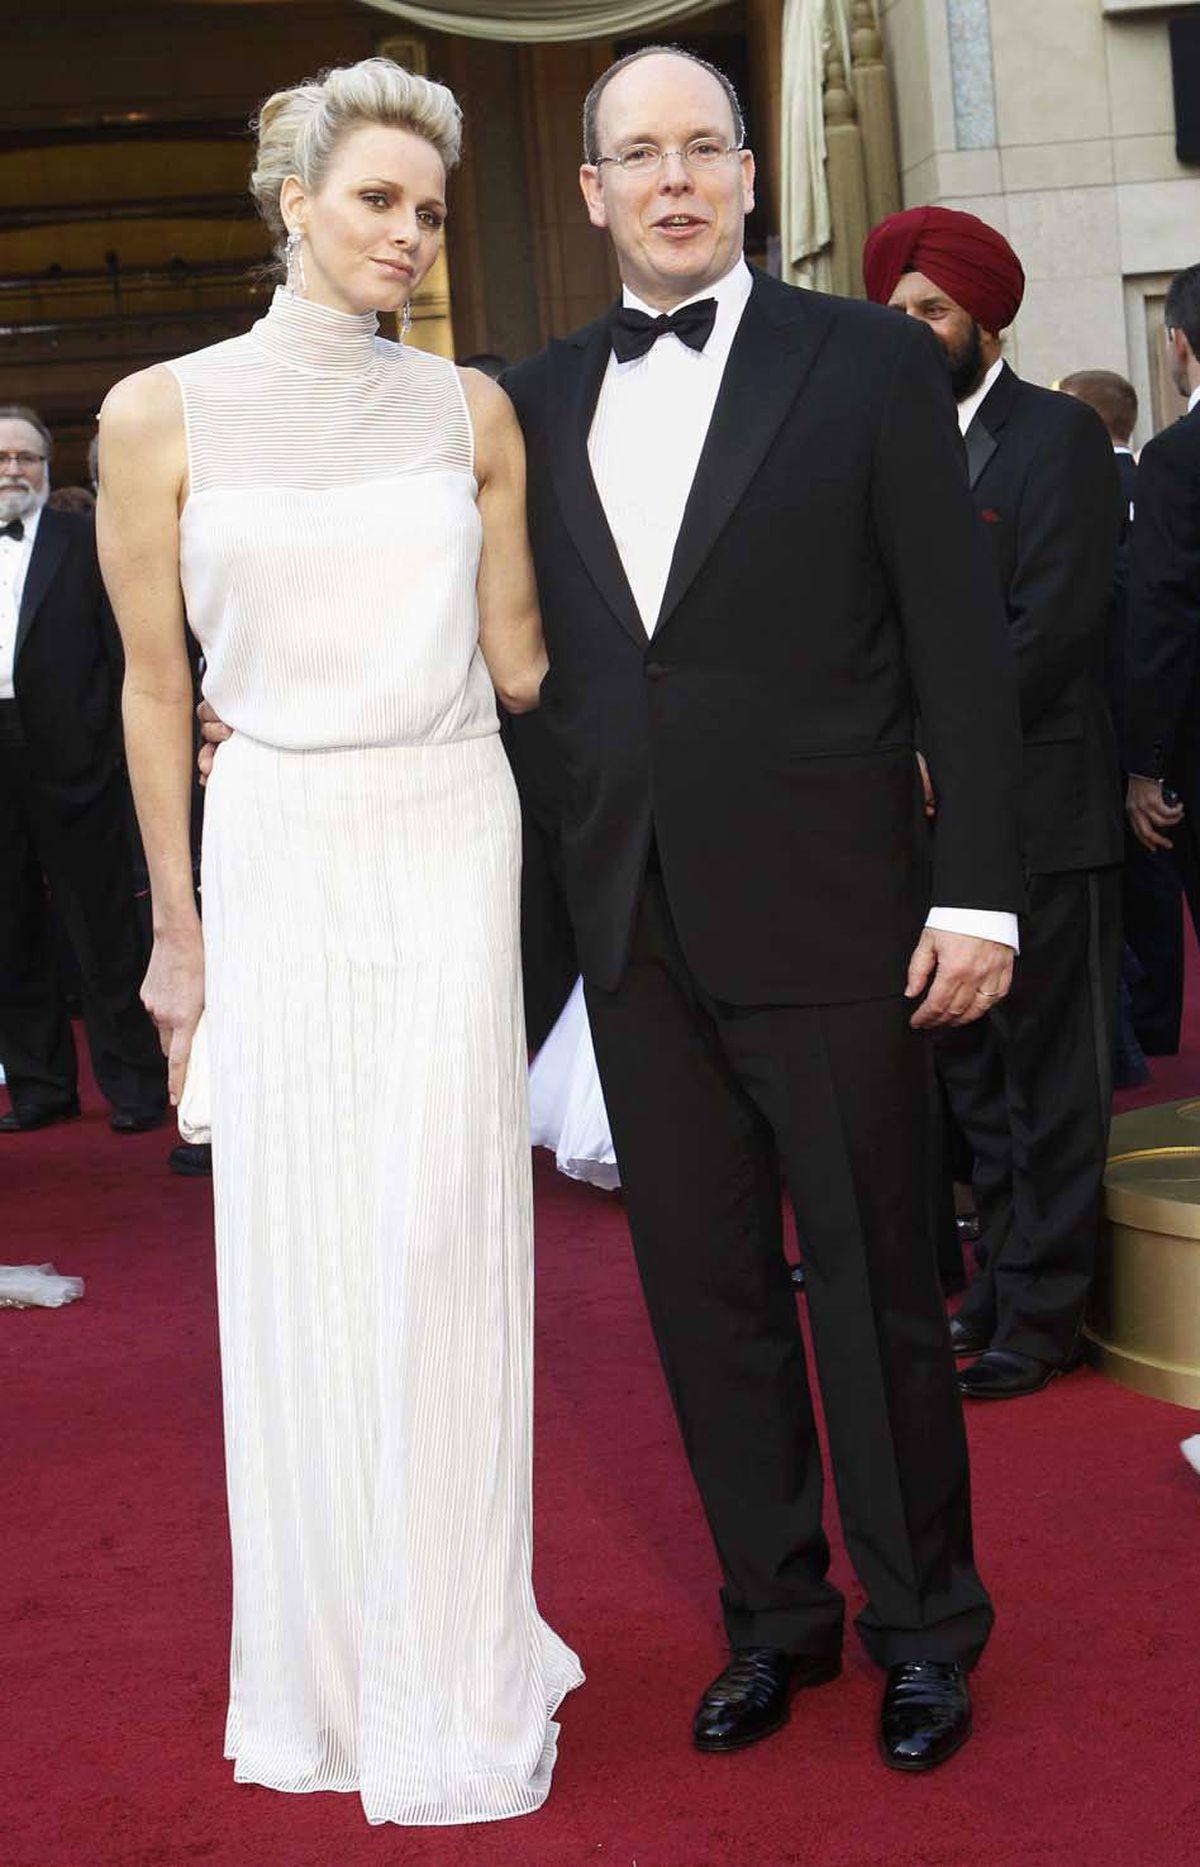 Prince Albert of Monaco keeps a tight grip on his dashing wife Princess Charlene at the Oscars on Sunday.